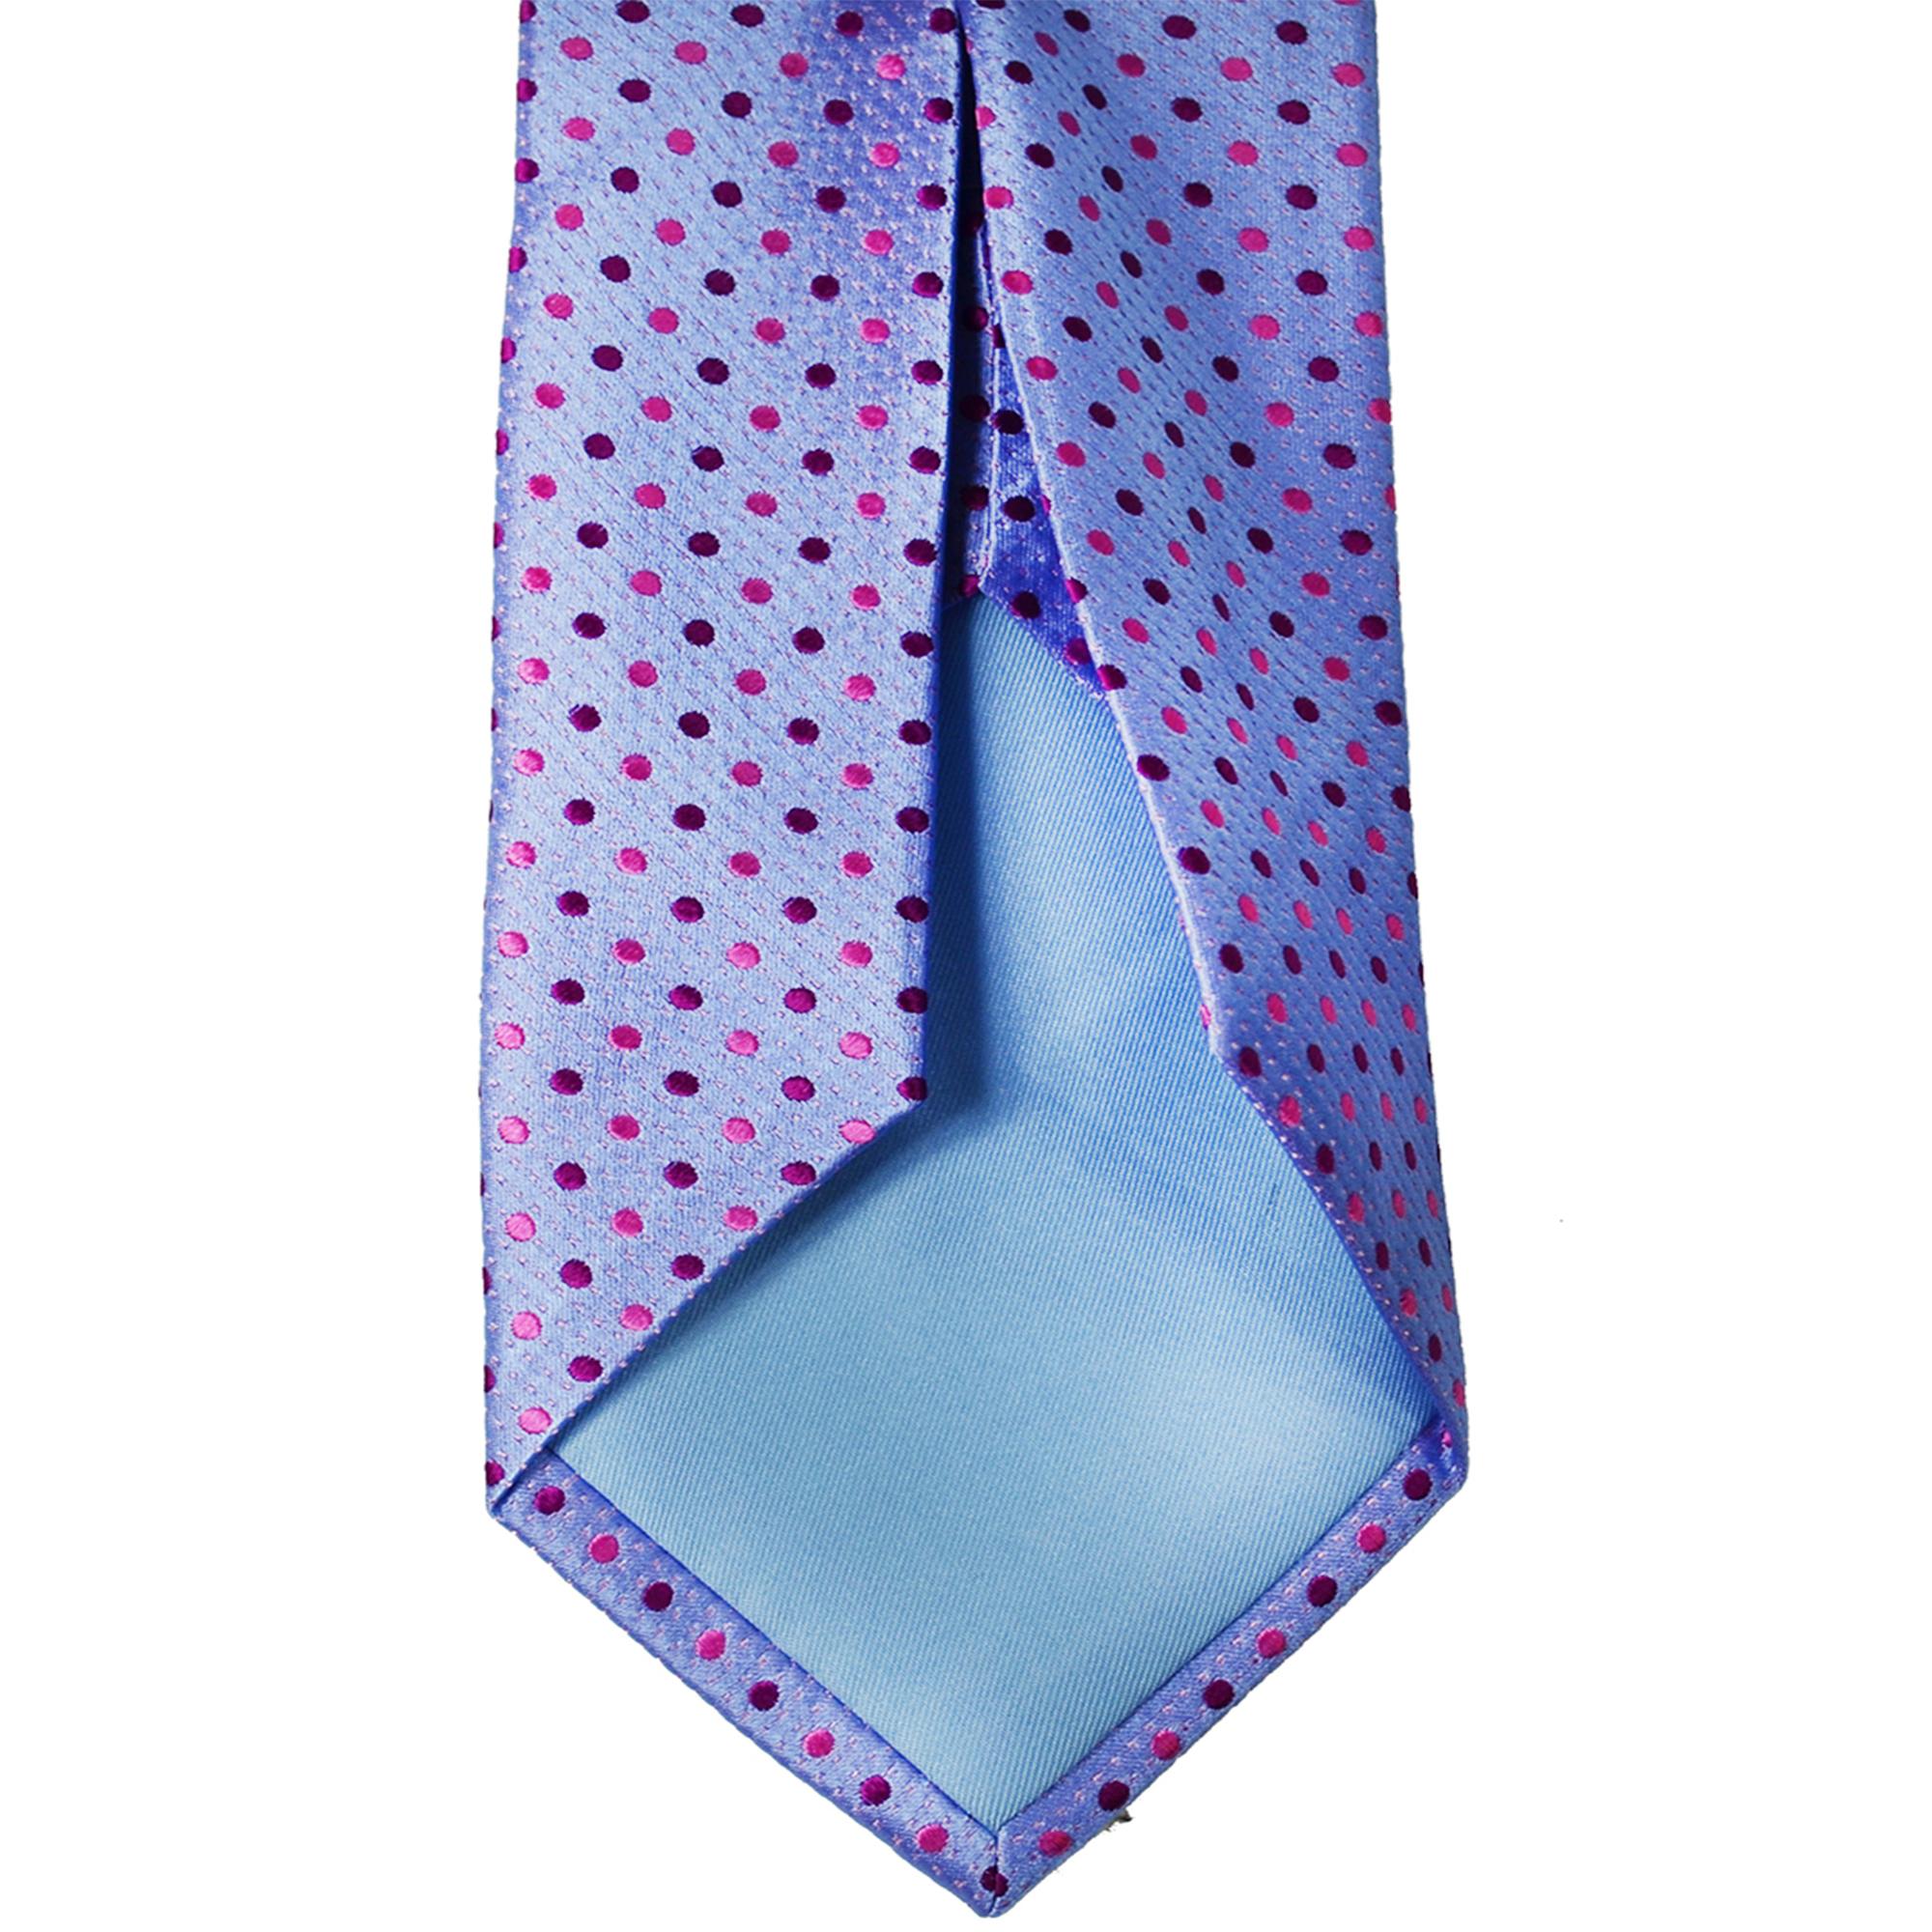 Aqua Silver Tie Pocket Square Set Paisley Patterned Handmade 100/% Silk Tie